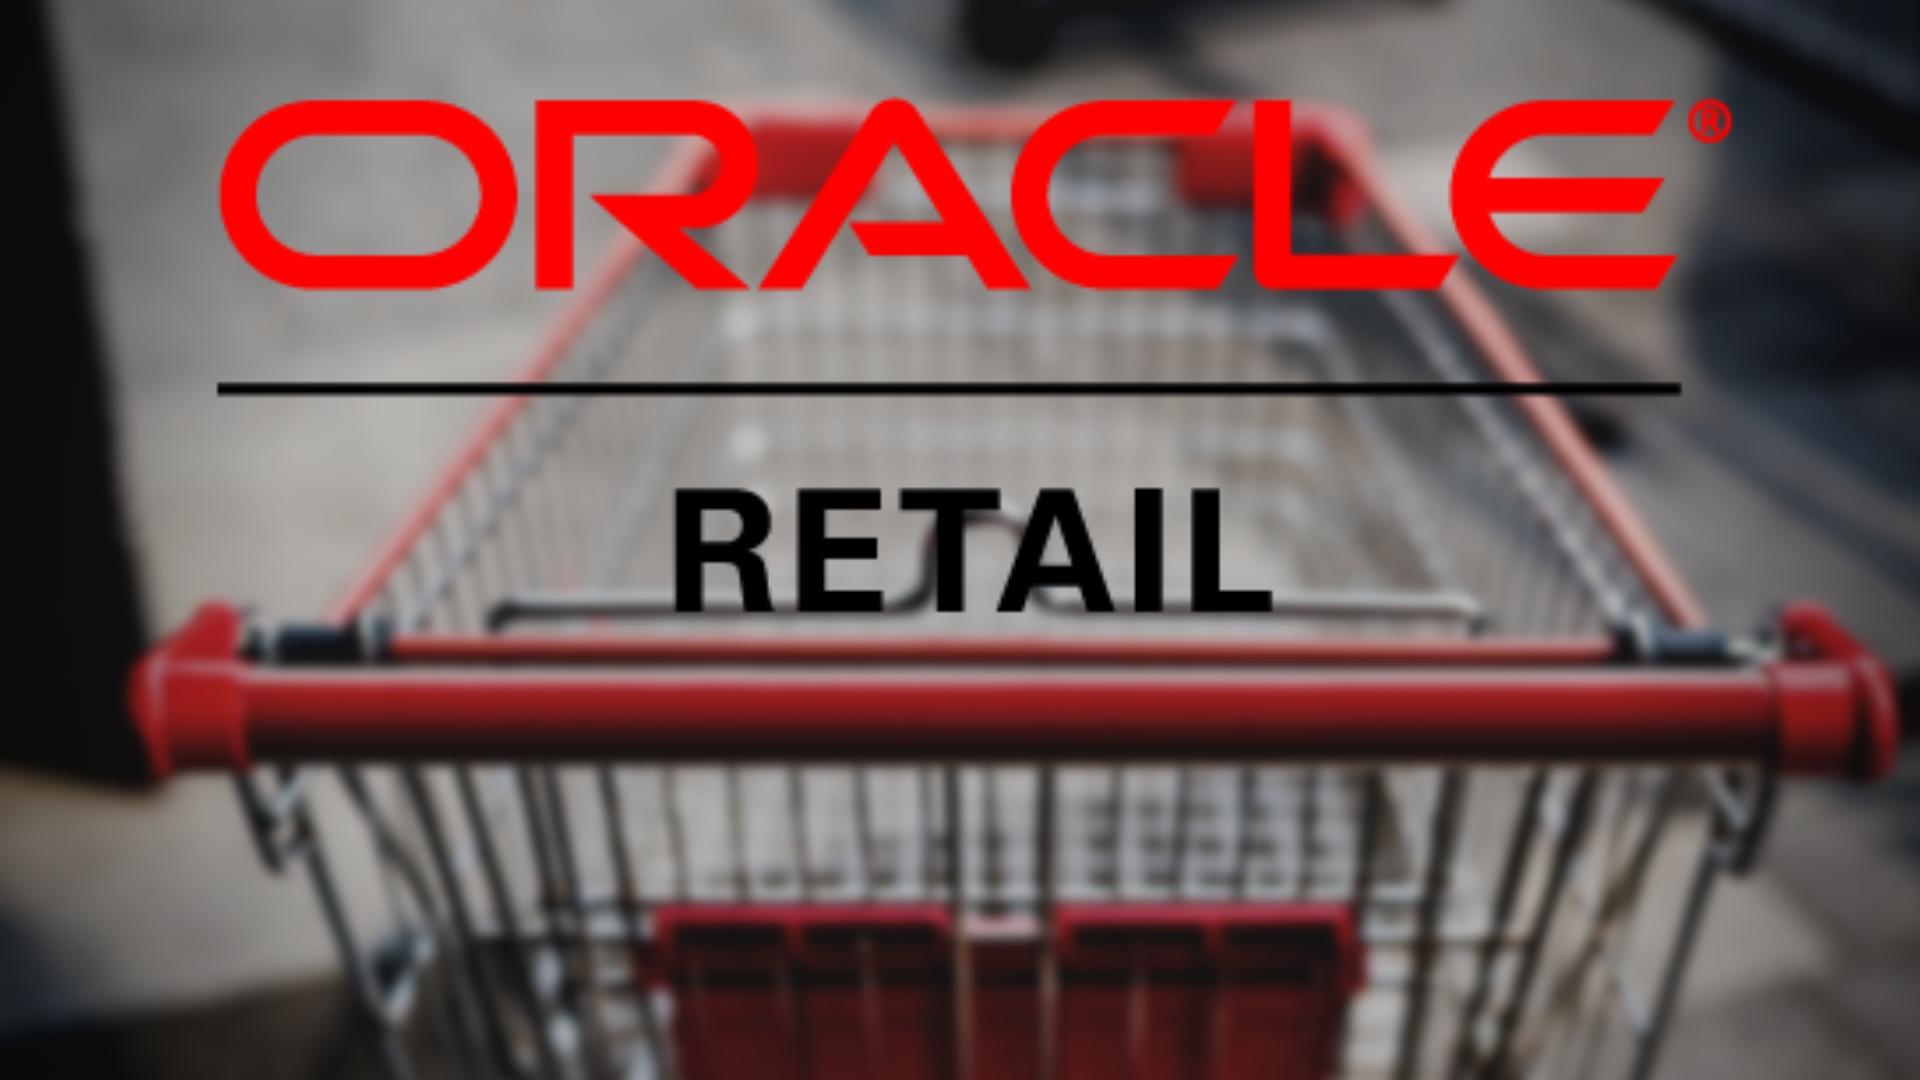 Oracle Retail